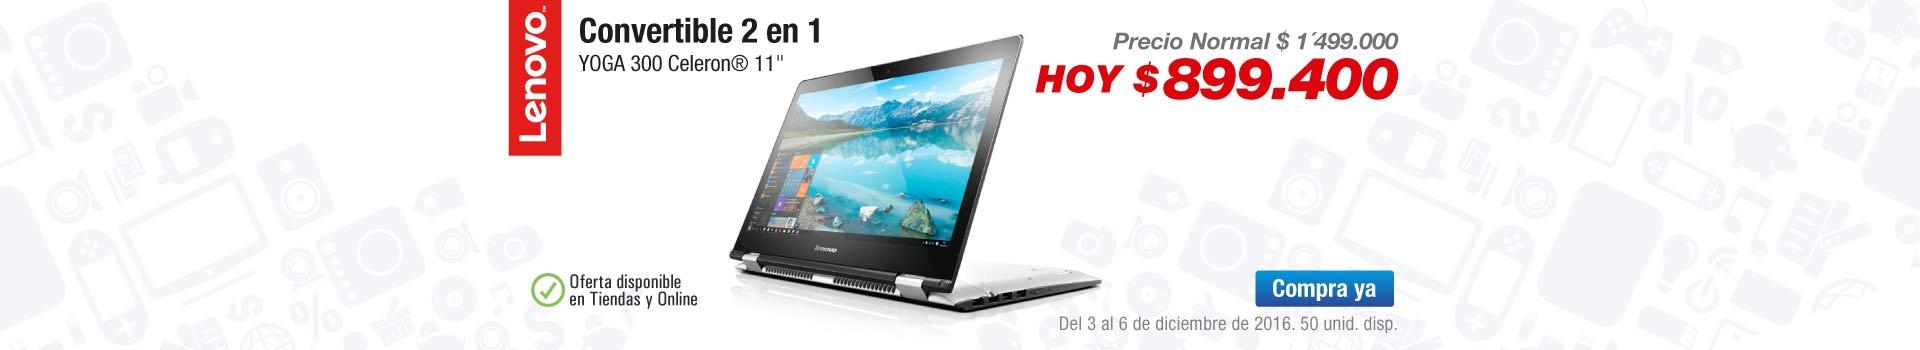 Ofertas Computadores y tablets - diciembre 2 - Convertible 2 en 1 LENOVO YOGA 300 Celeron 11